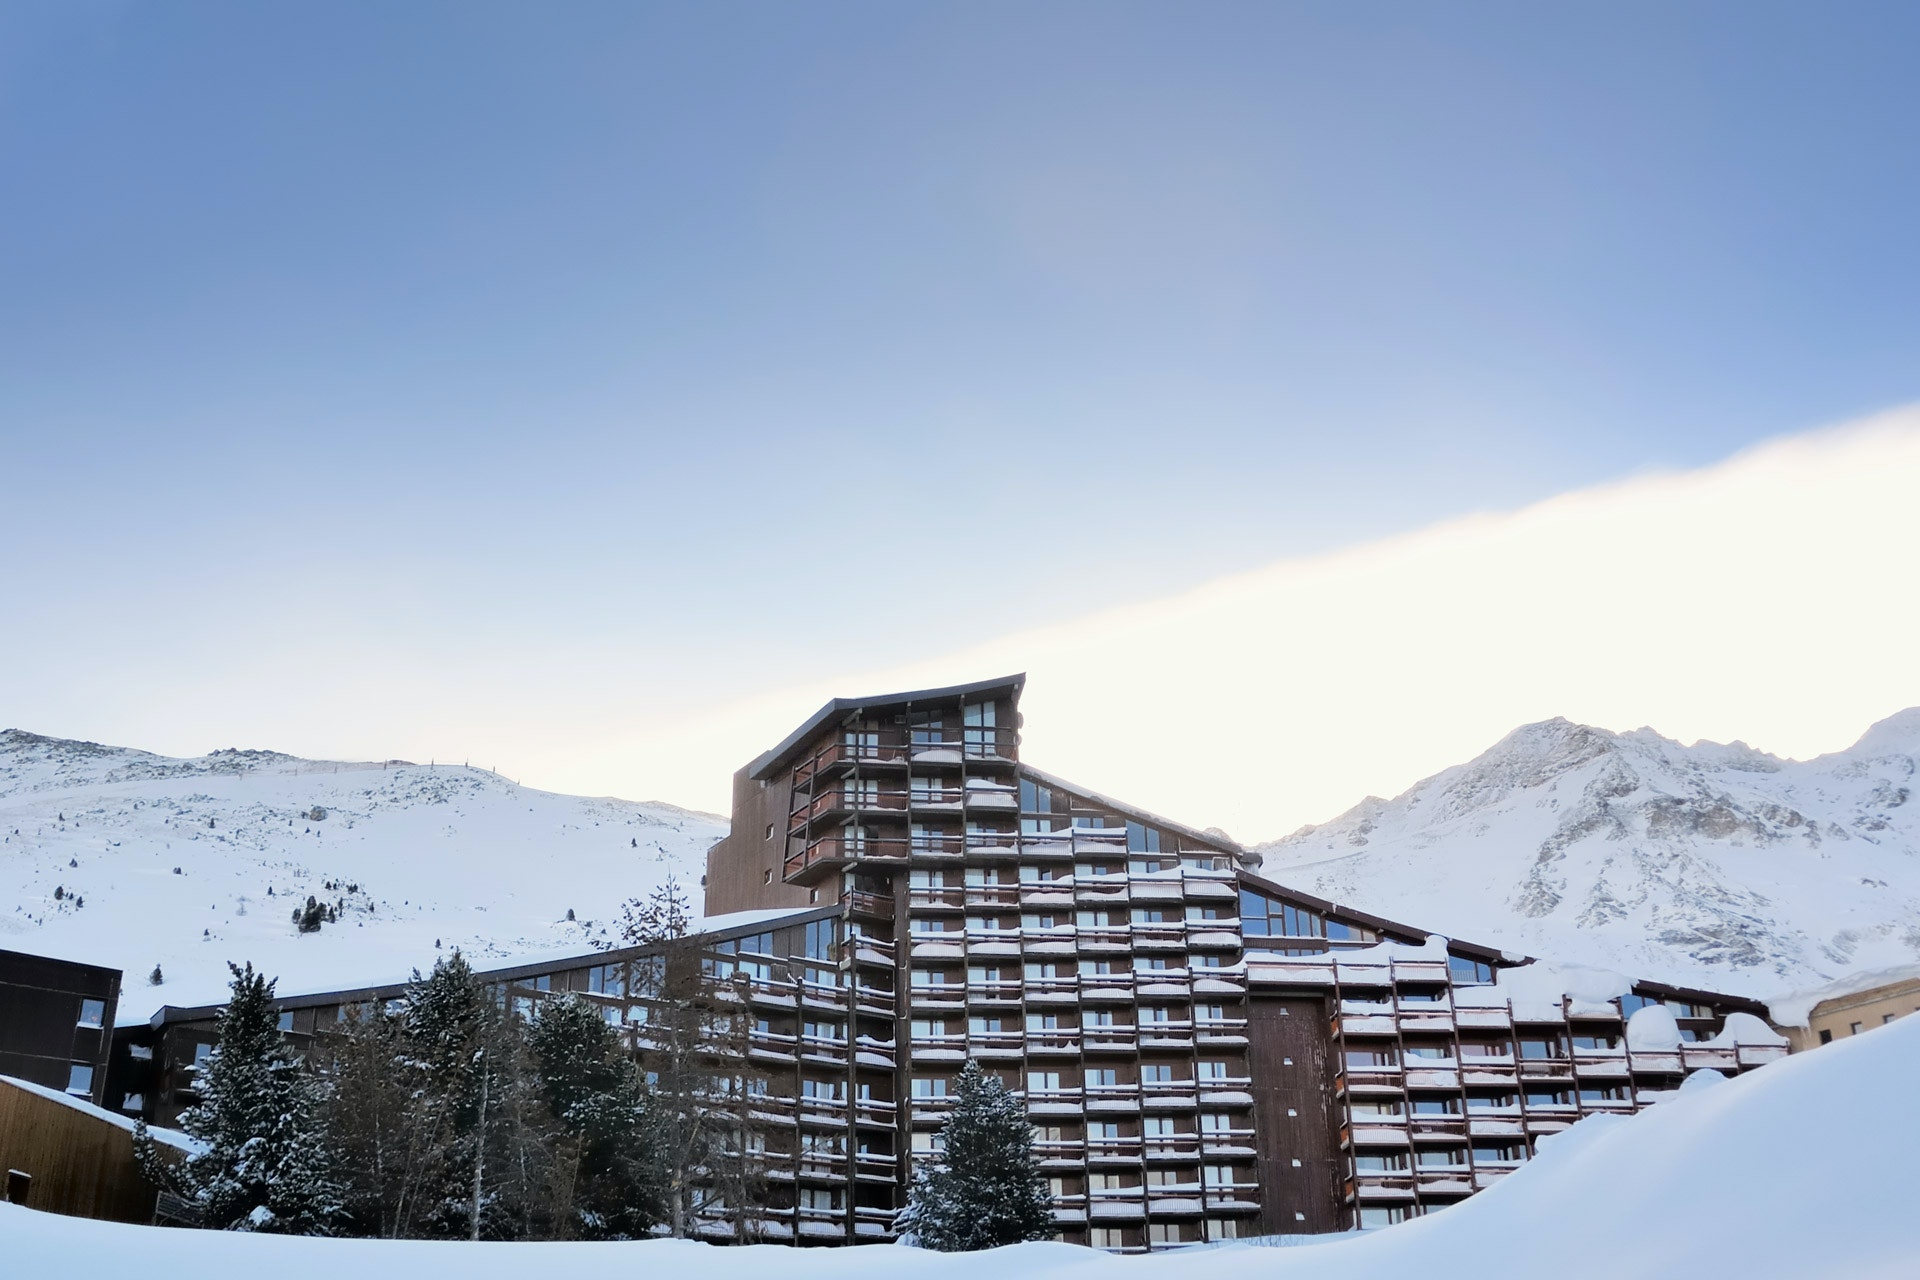 Eco-Travel-Ski-Trip-Les-Arcs